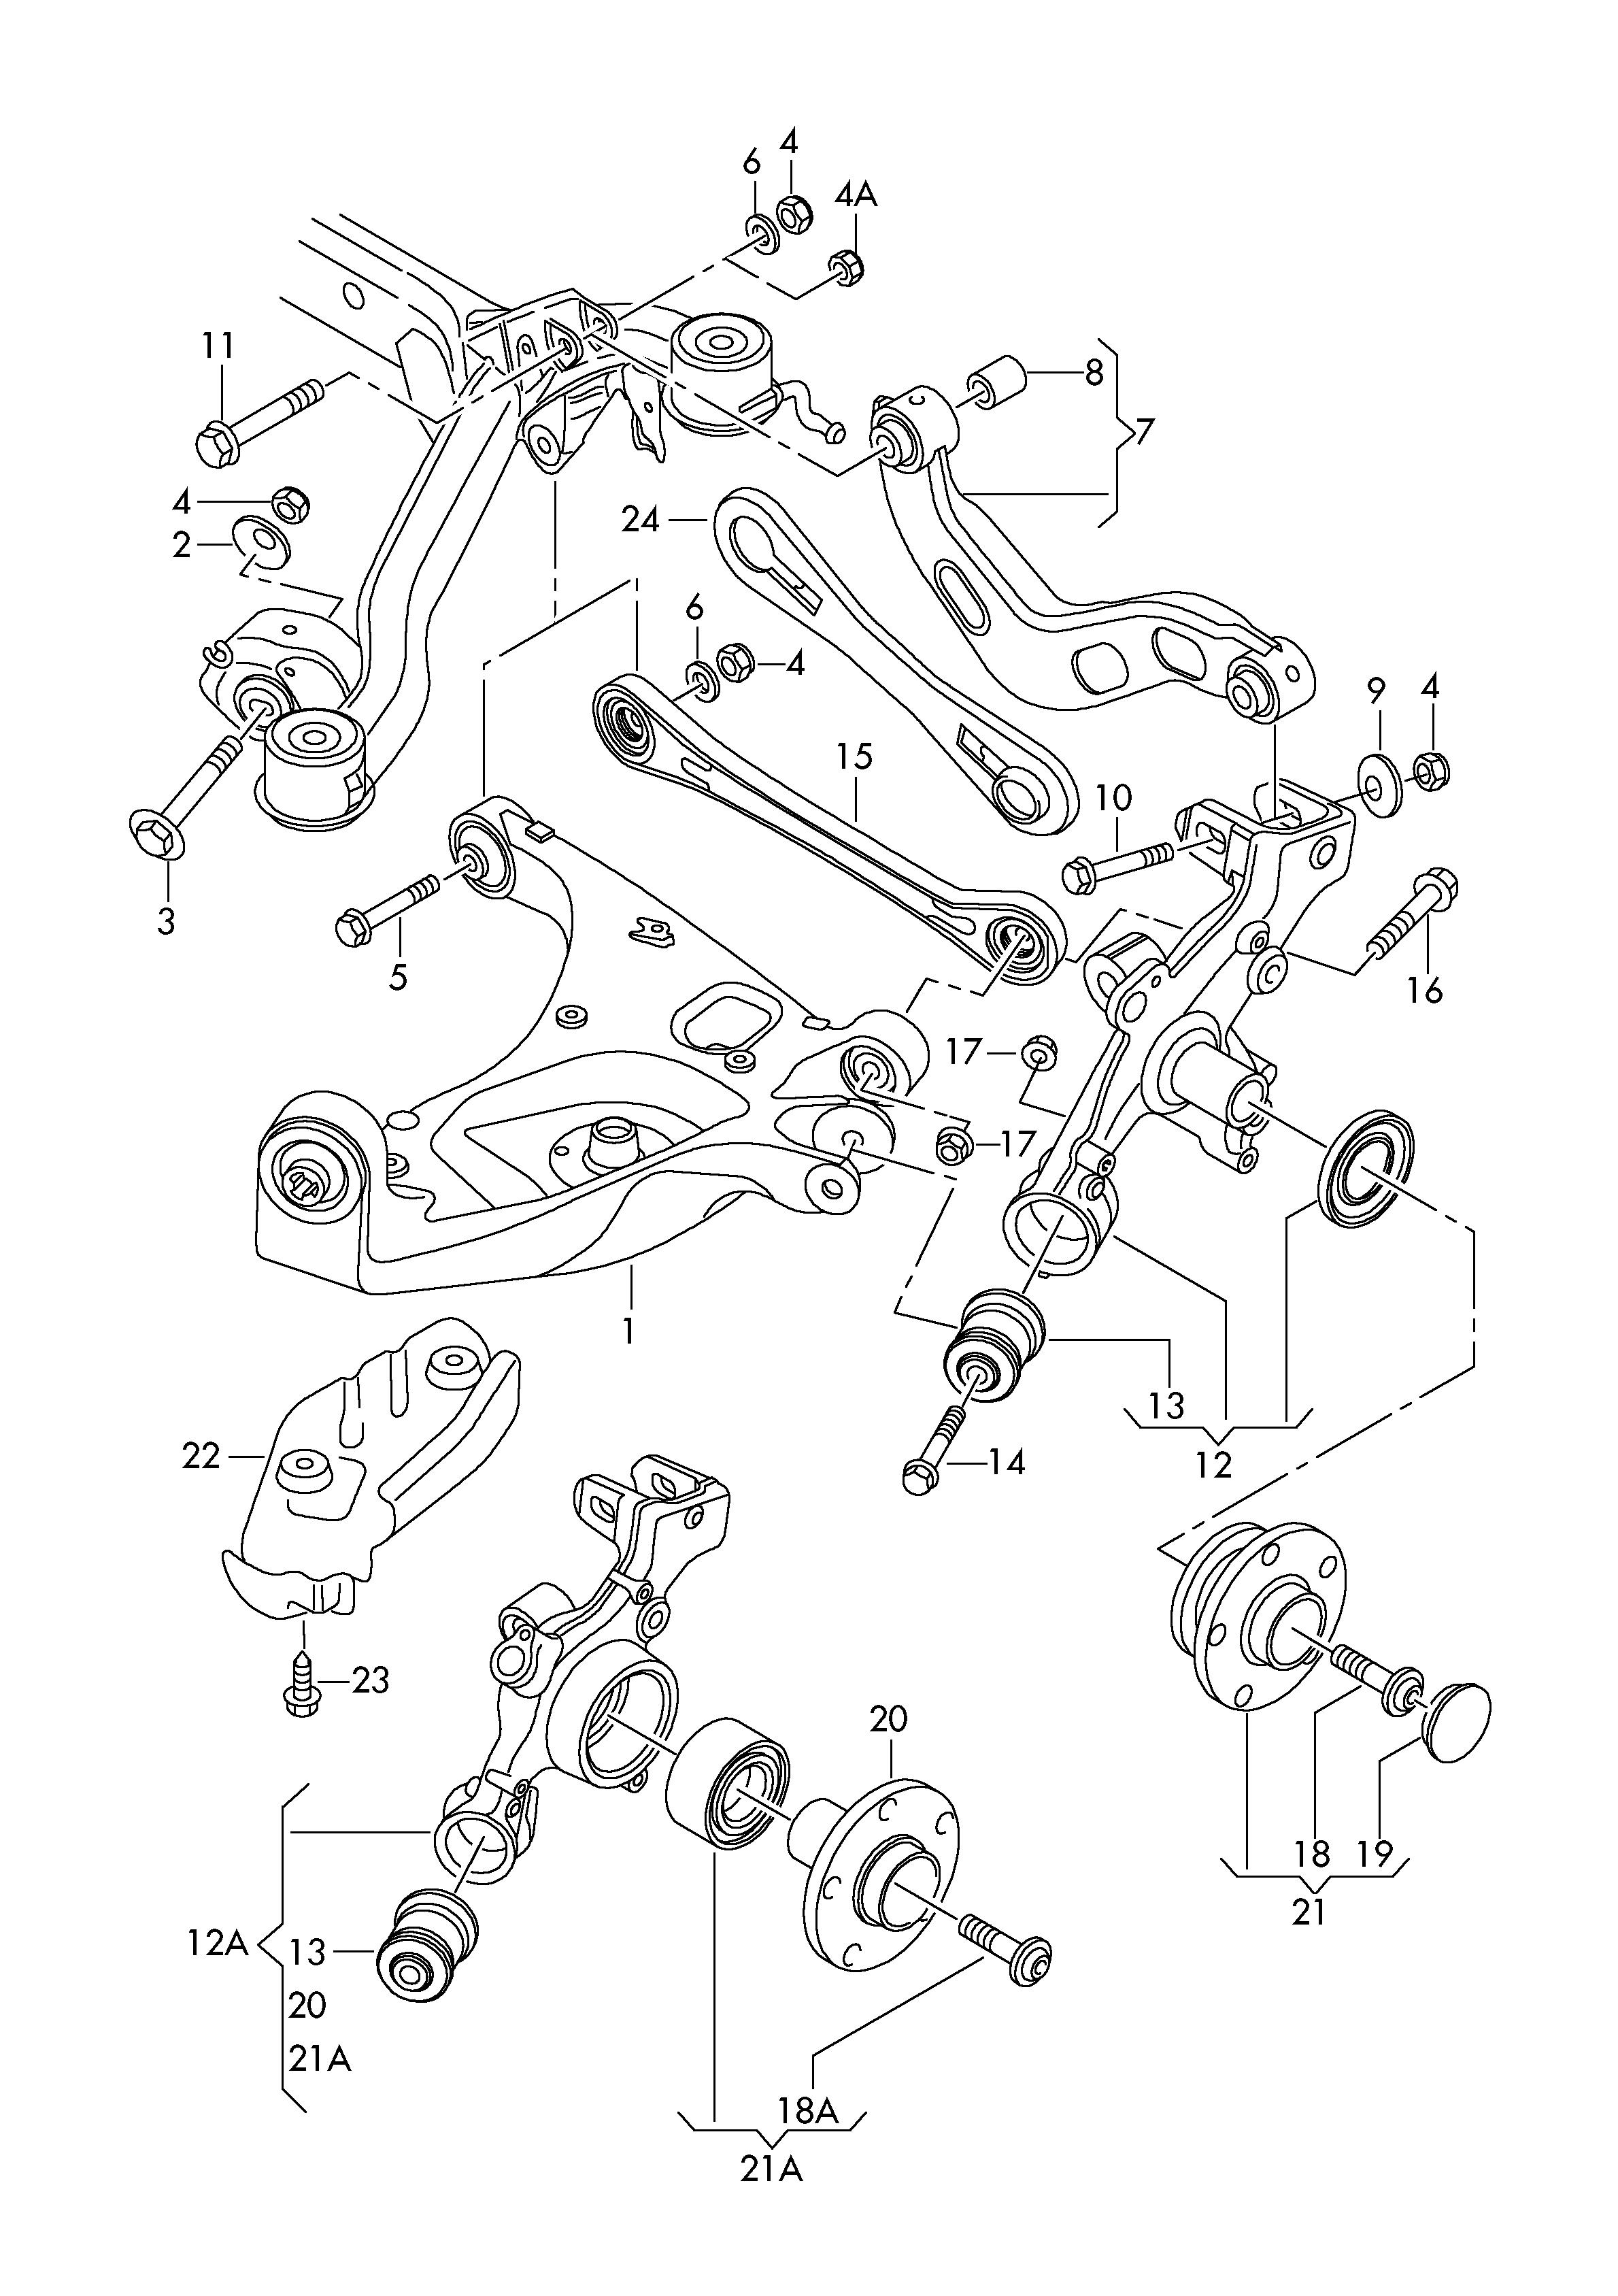 2007 Audi A4 Exhaust Diagram